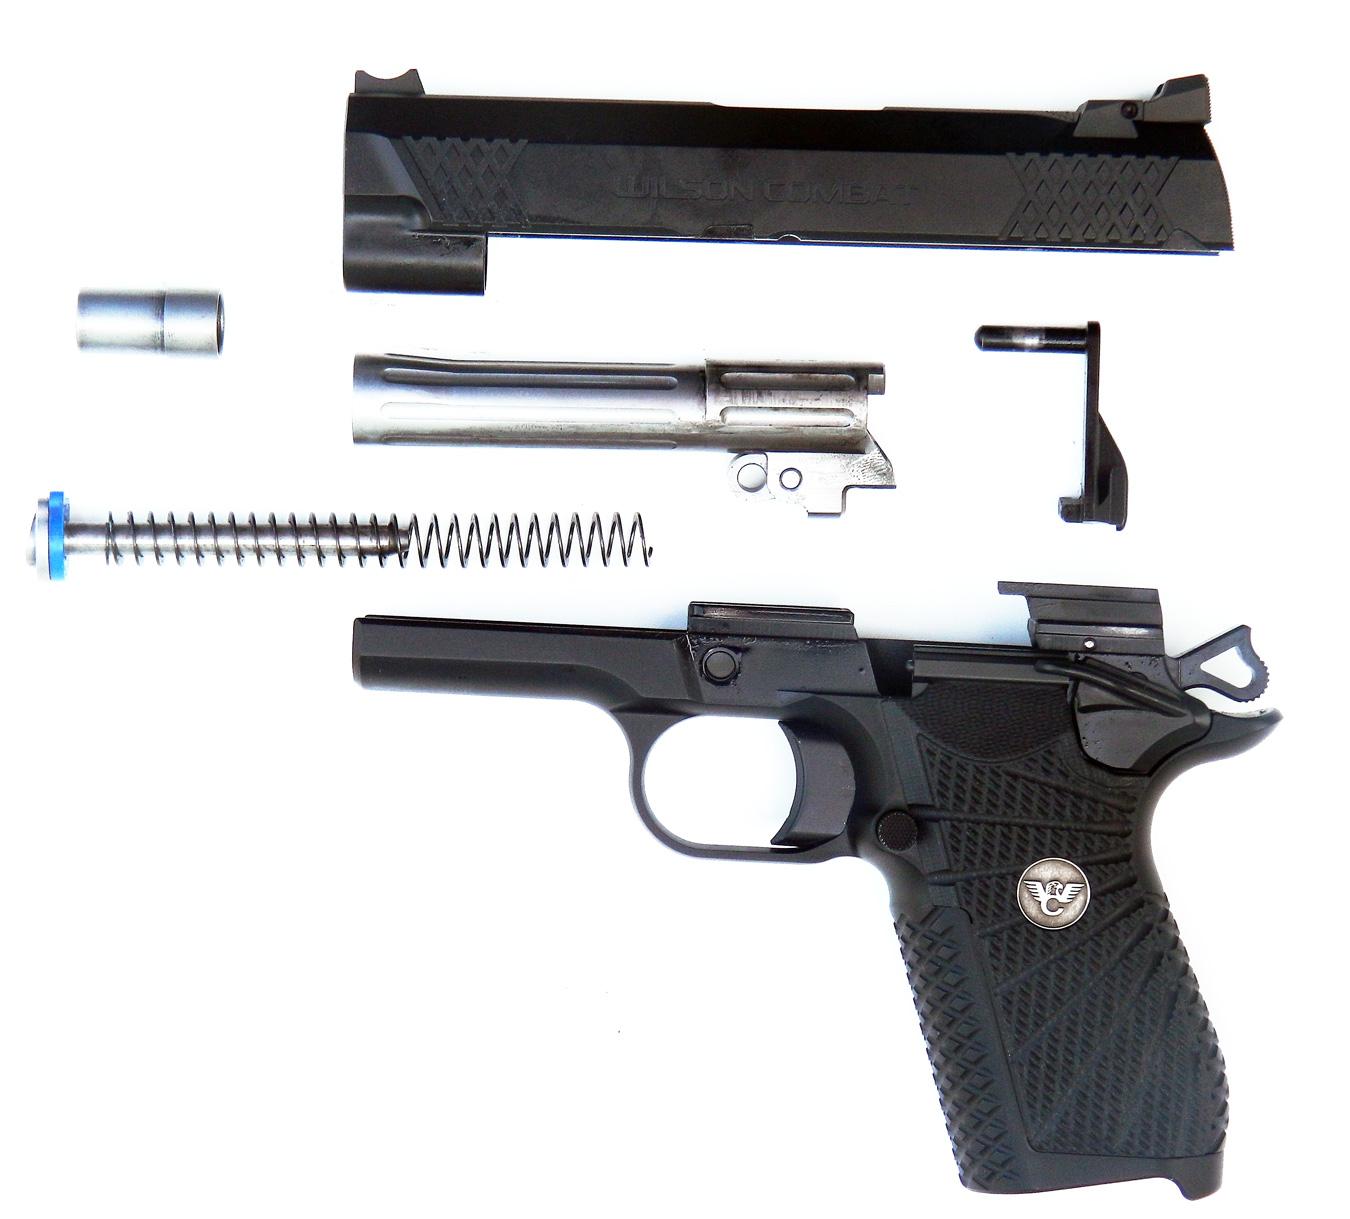 Disassembled Wilson Combat EDC X9 pistol